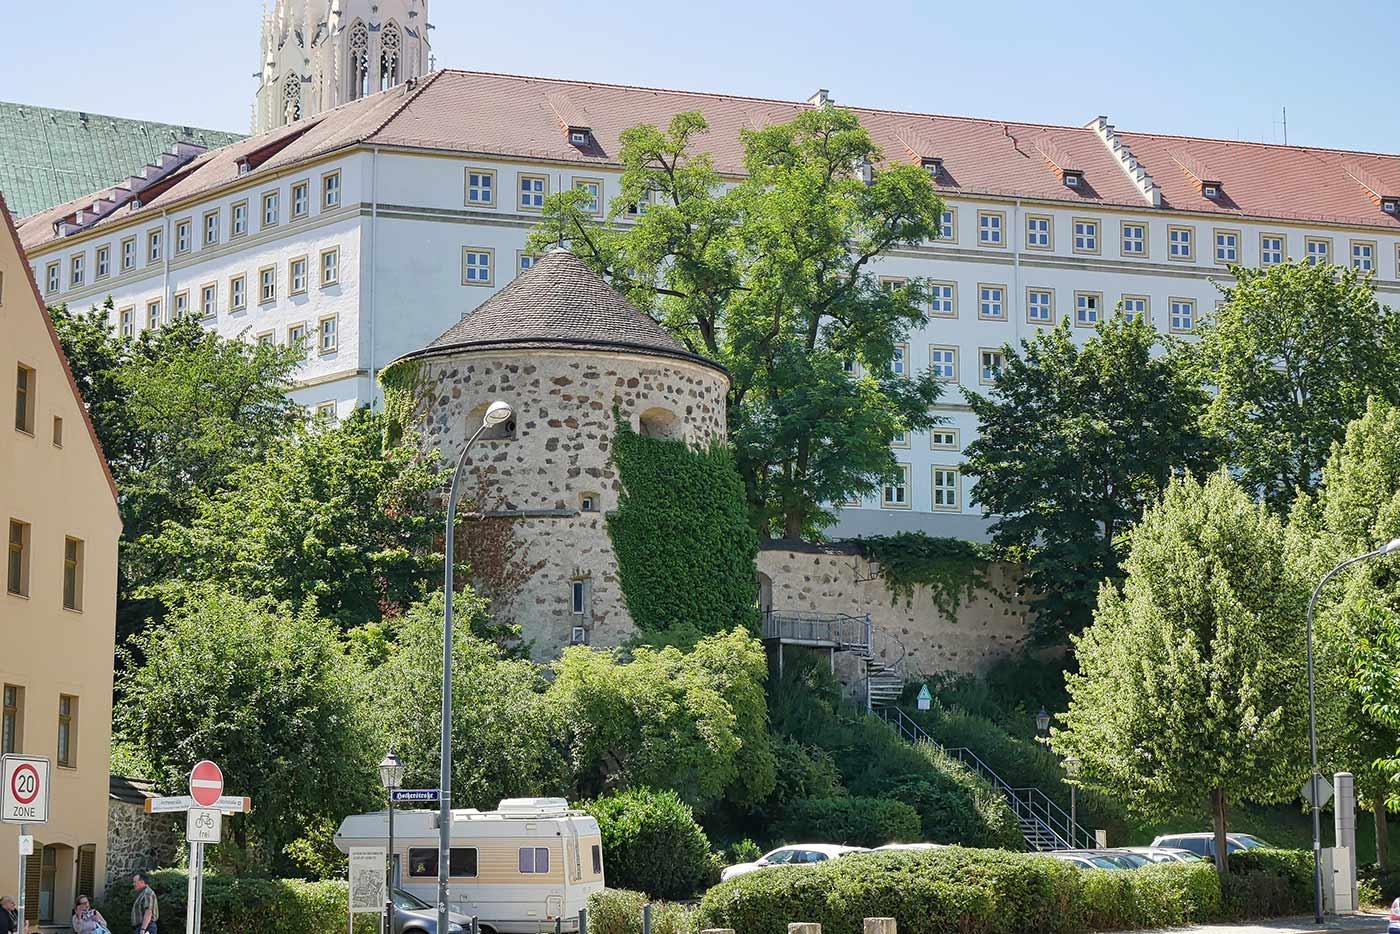 Hotherturm (Hotherbastei) Görlitz